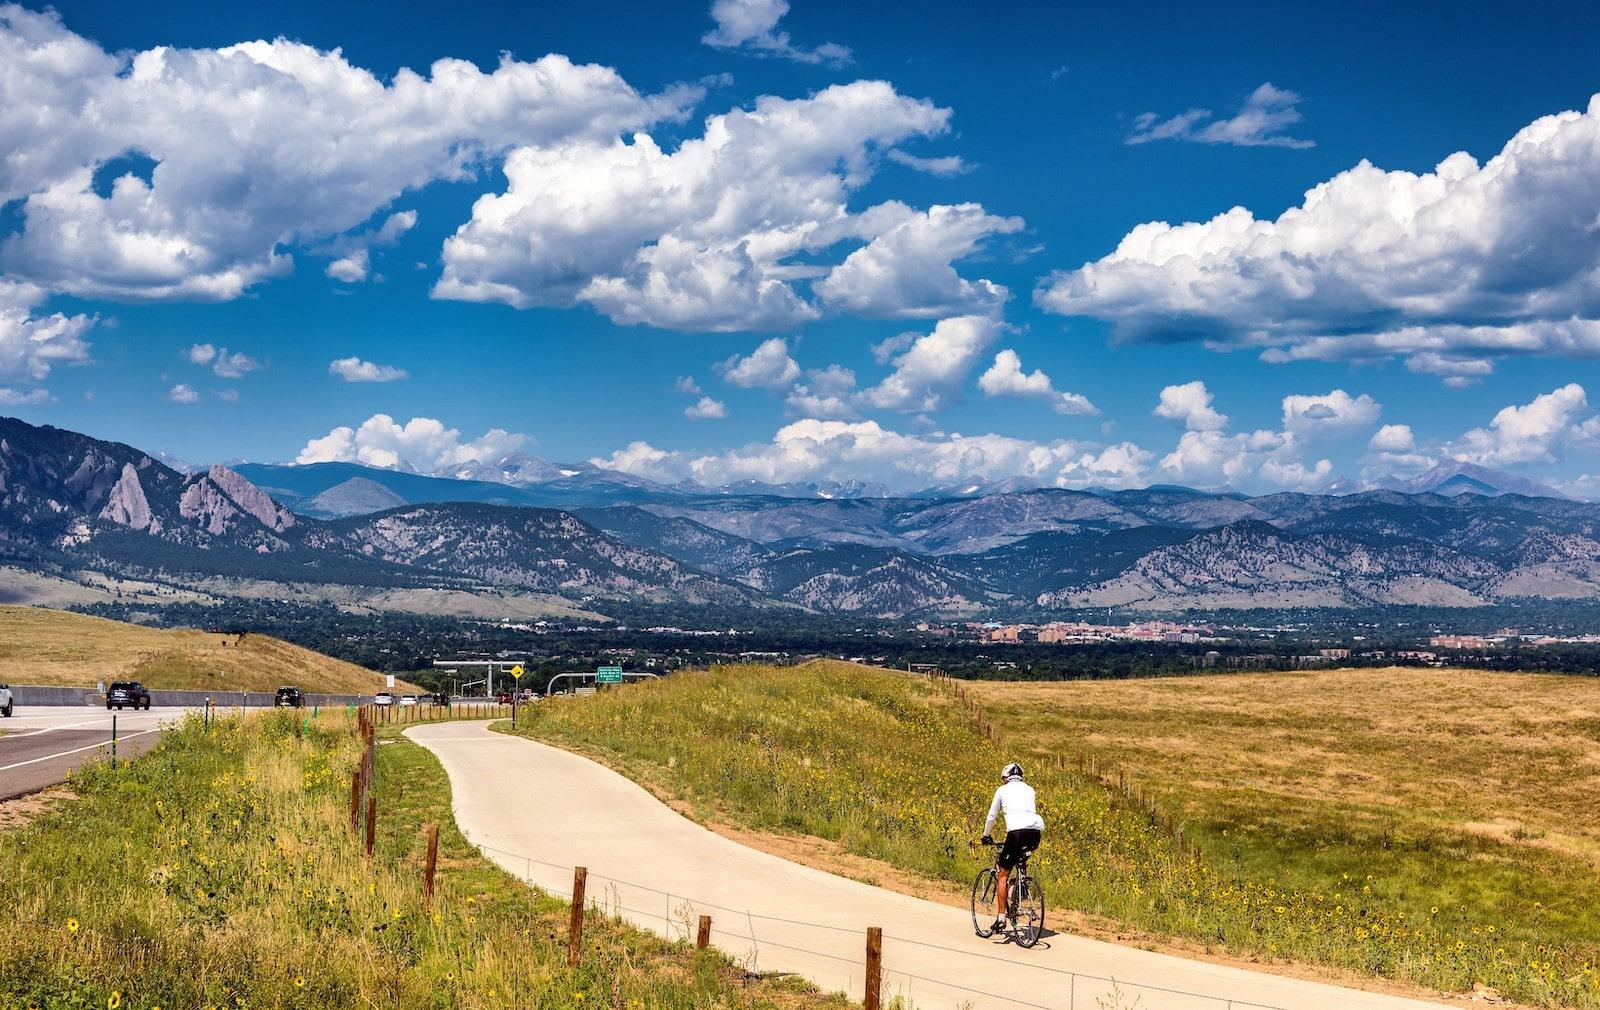 Bersepeda ke Boulder, Colorado